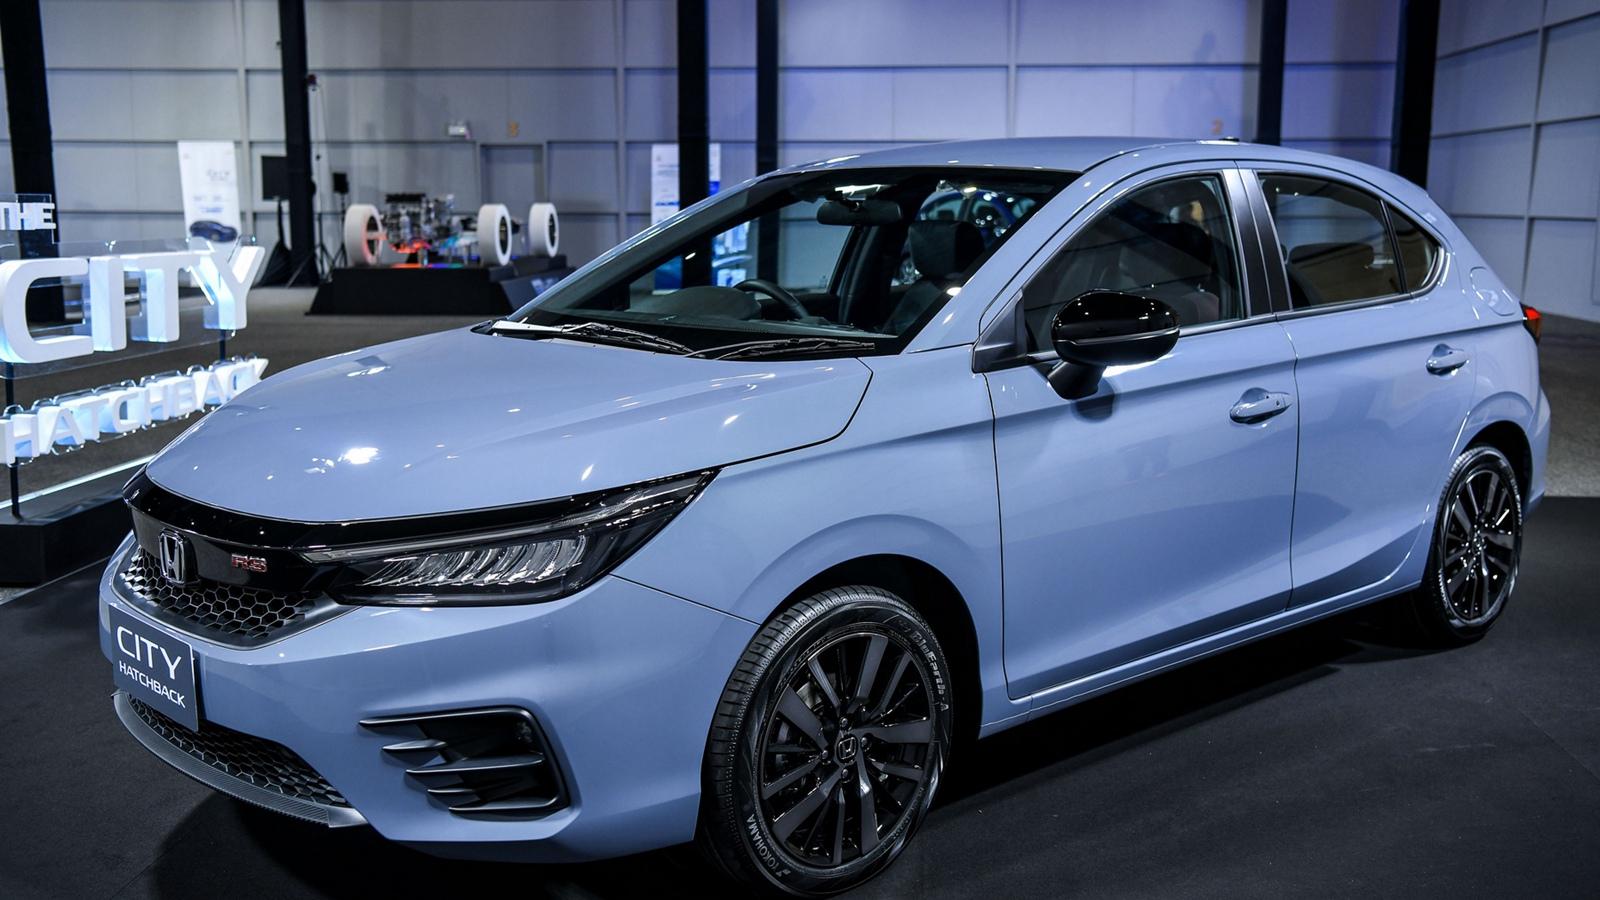 2021 Honda City Hatchback International Version Price ...